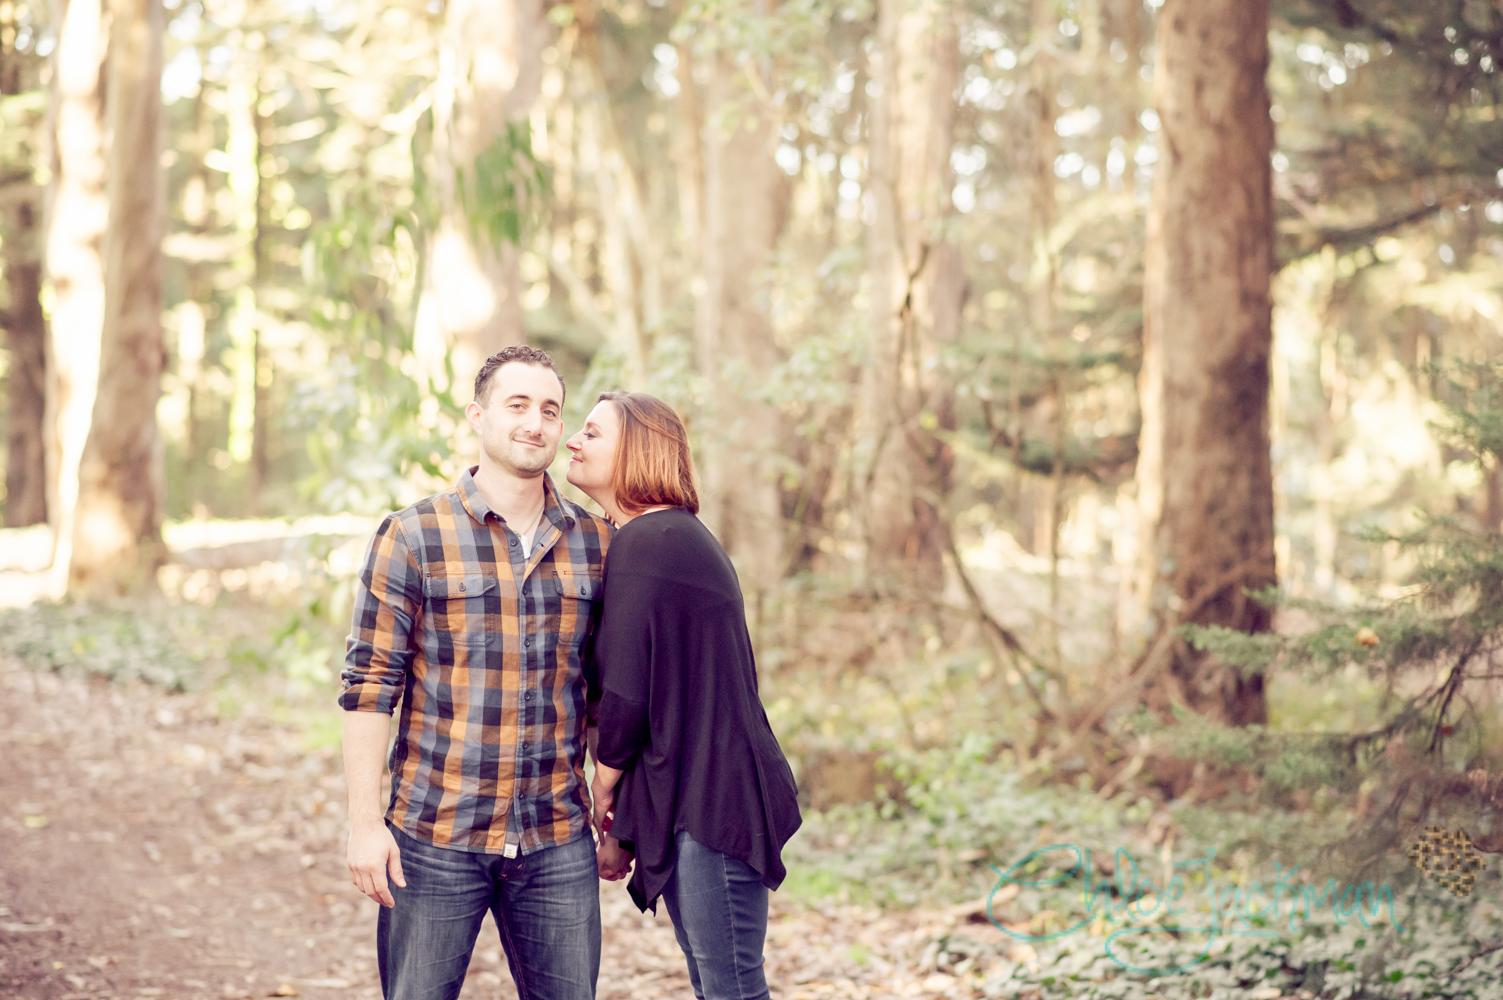 Chloe-Jackman-Photography-Golden-Gate-Park-Engagement-Session-2014-146